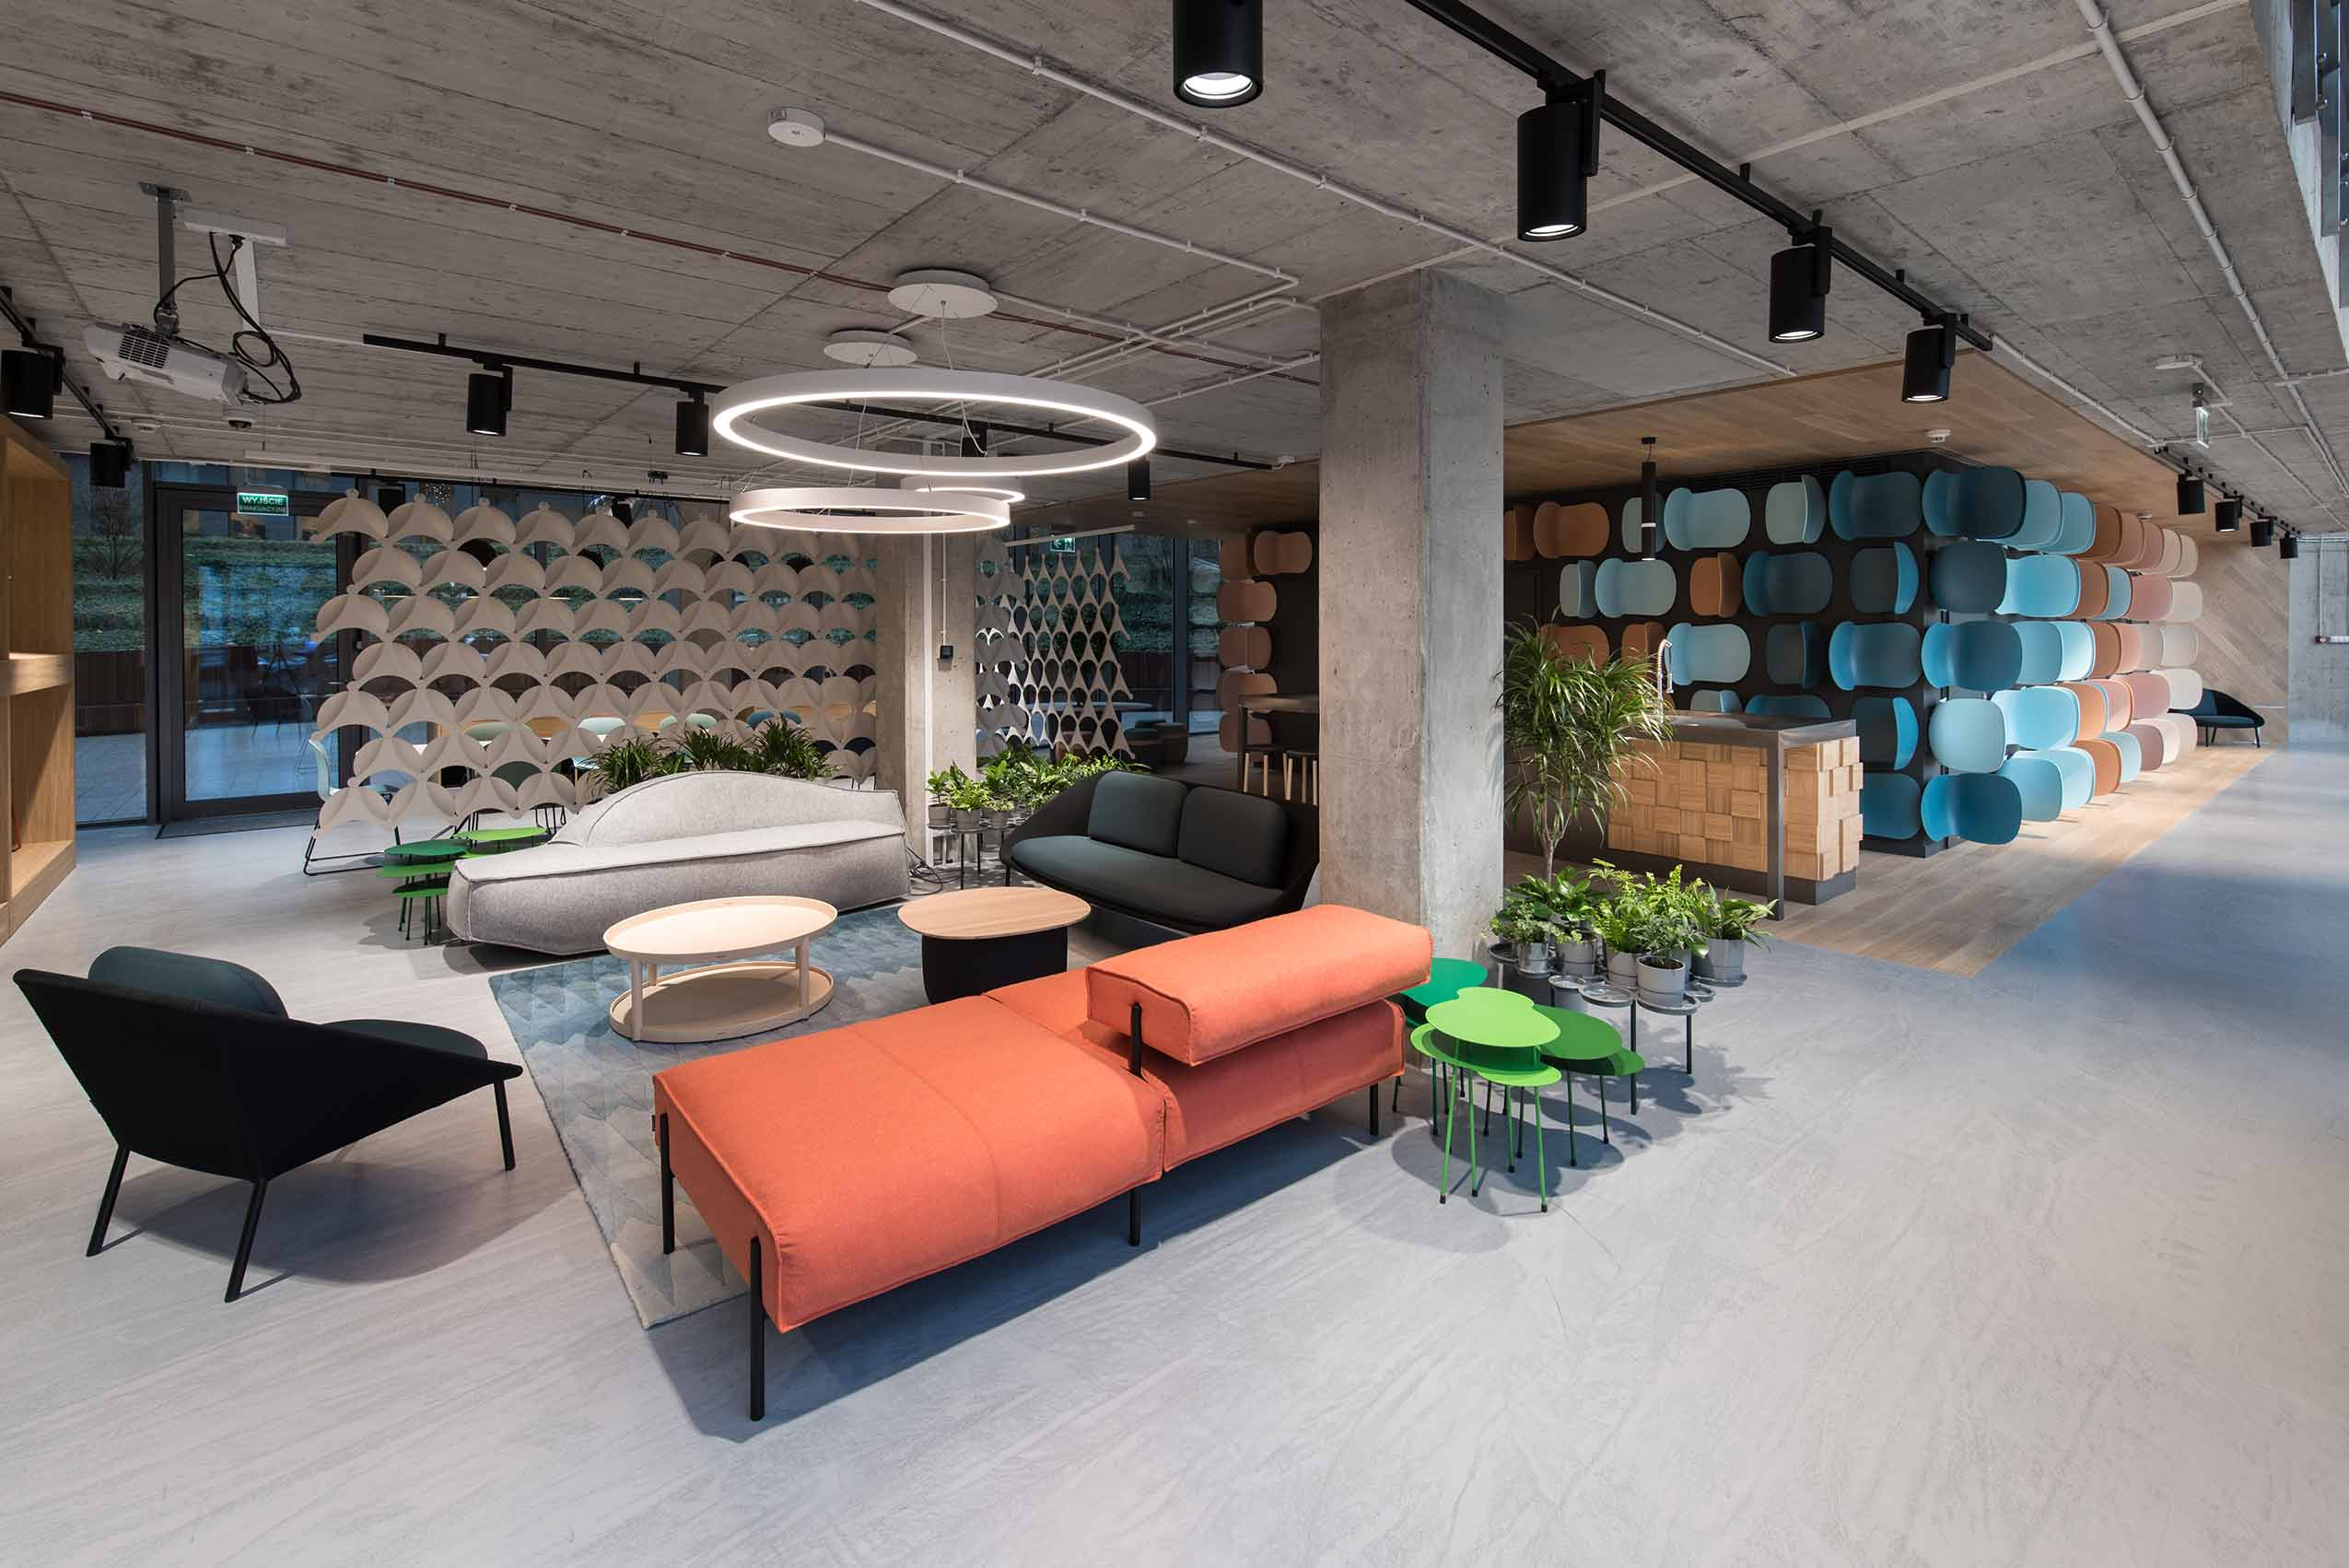 Flokk furniture showroom in poland warsaw scandinavian design led interior architecture